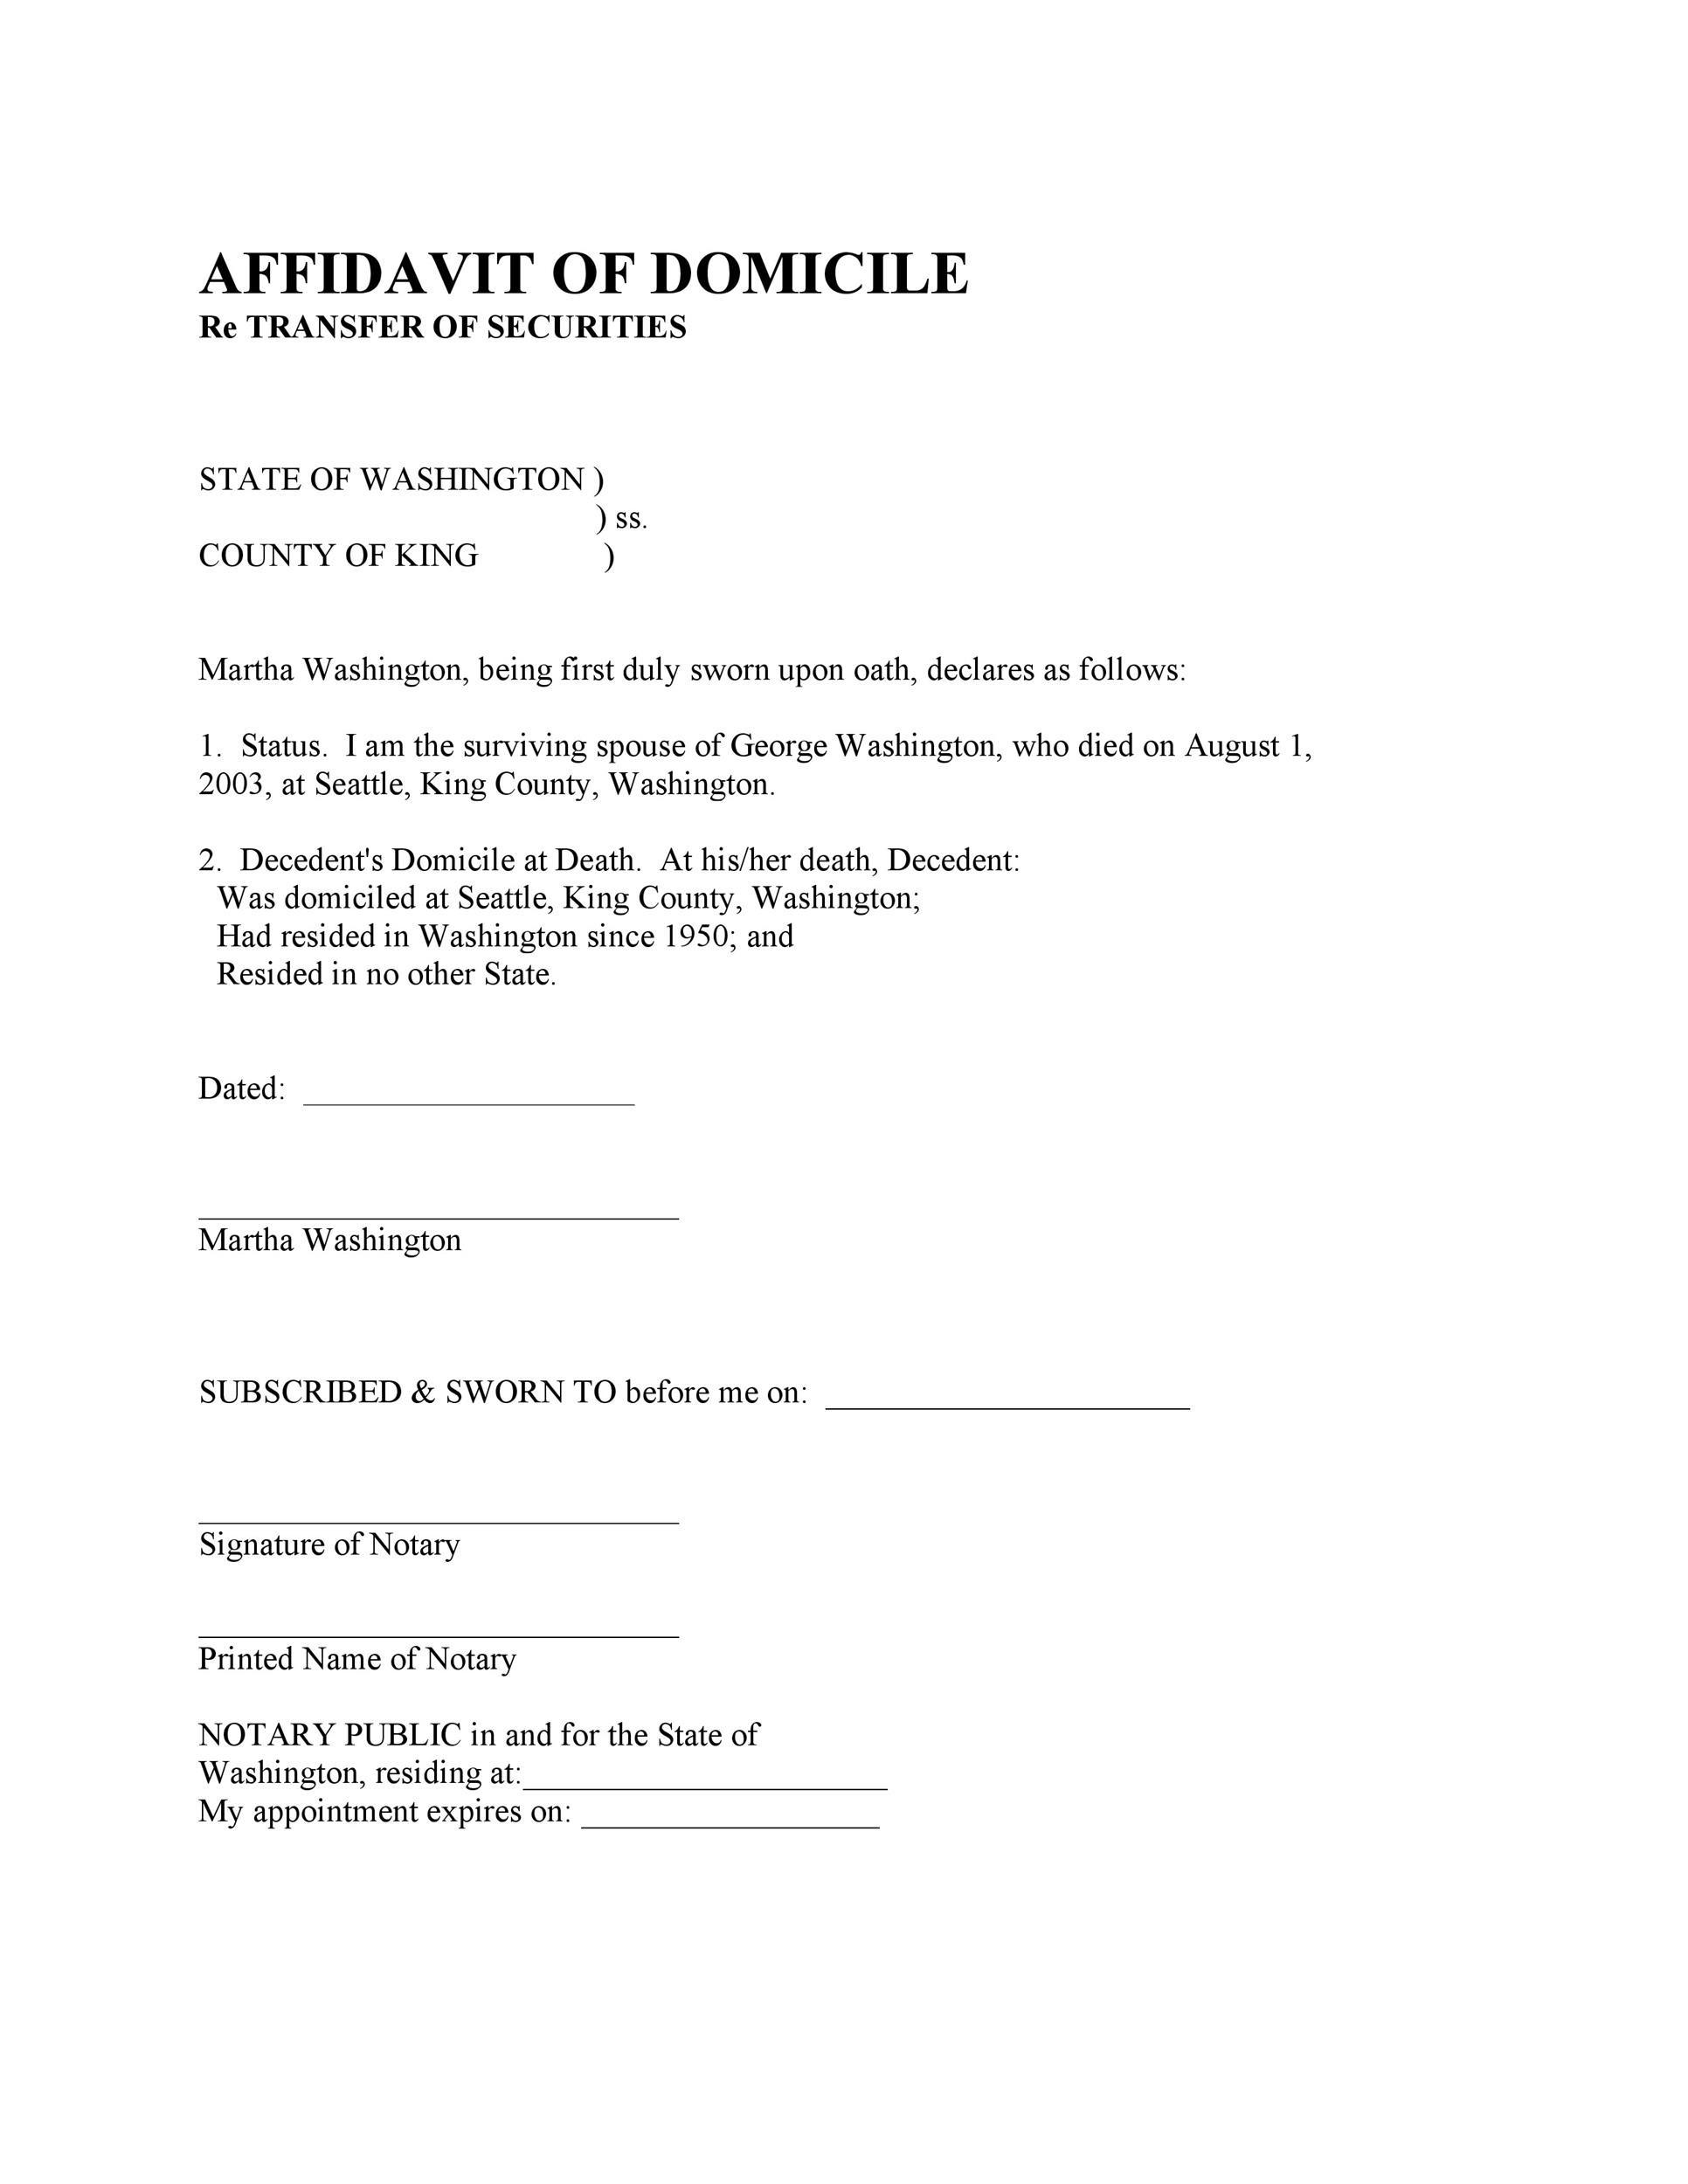 Free affidavit of domicile 50